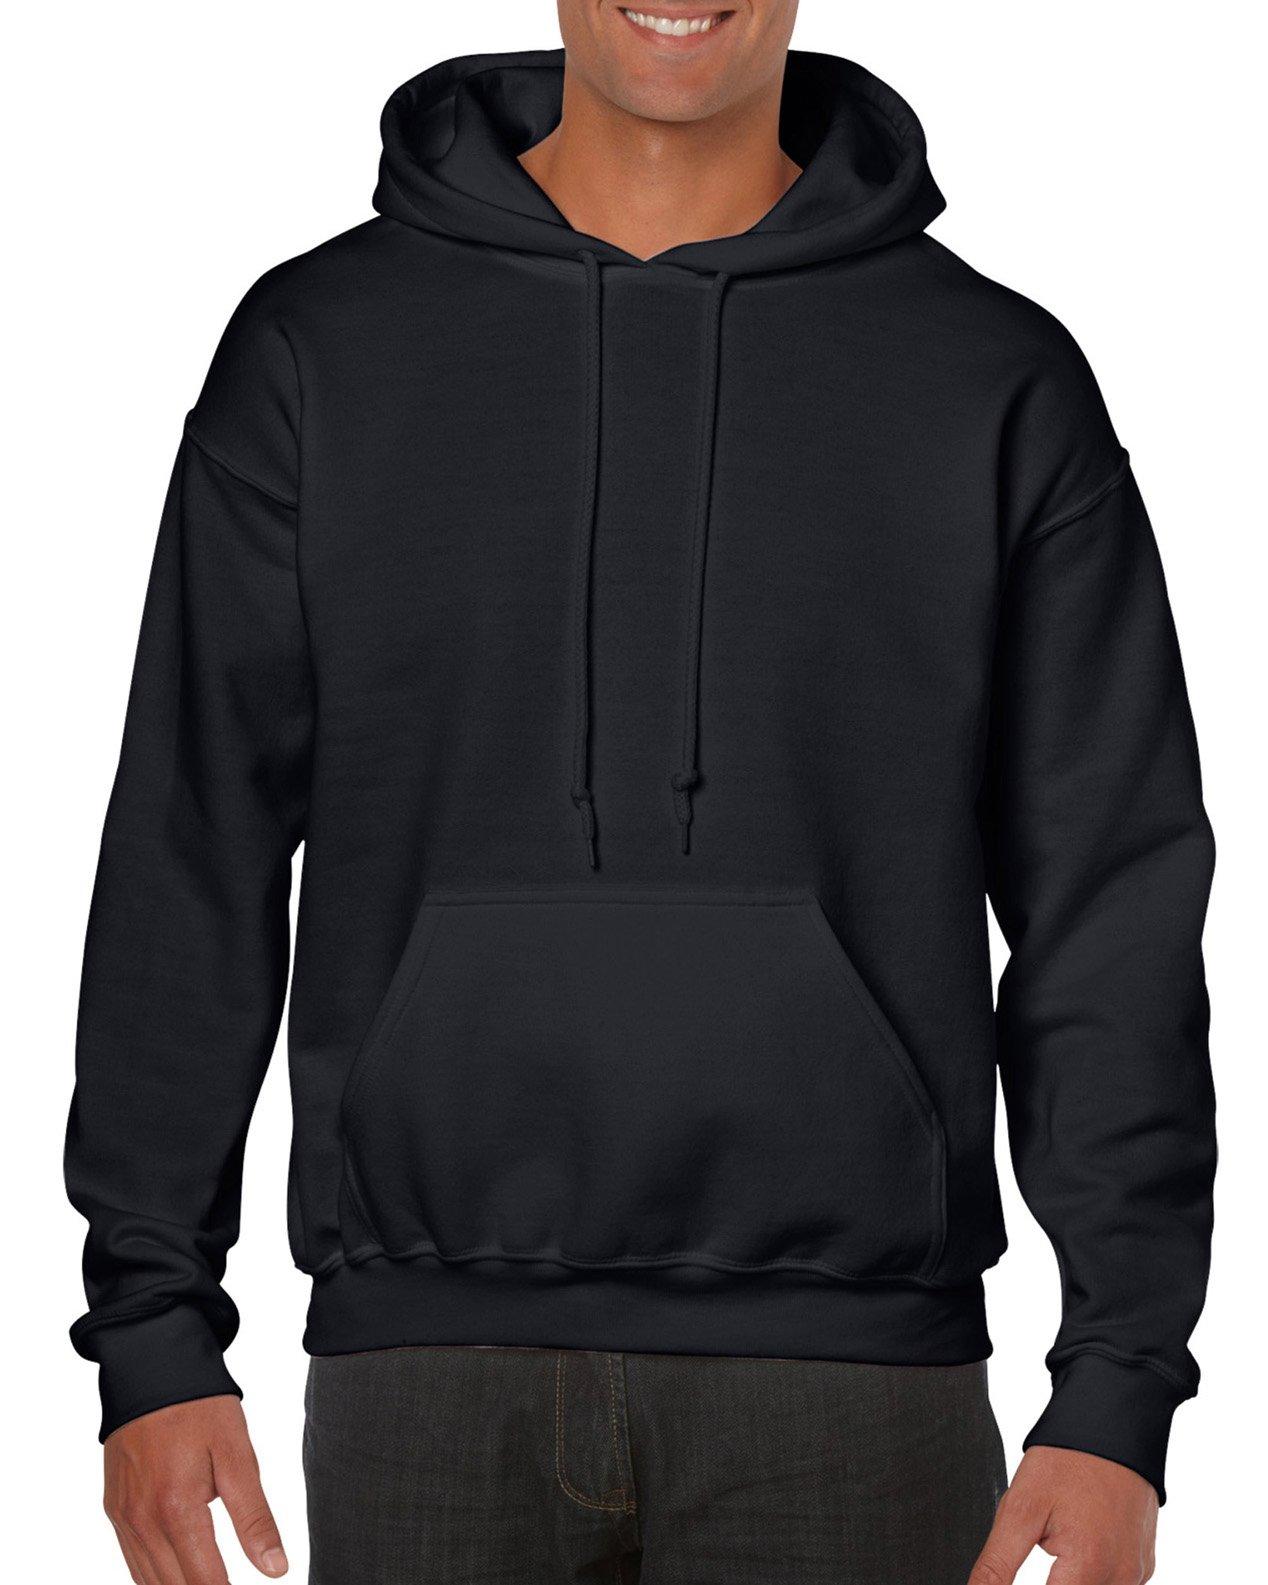 Gildan Men's Heavy Blend Fleece Hooded Sweatshirt G18500, Black, Large by Gildan